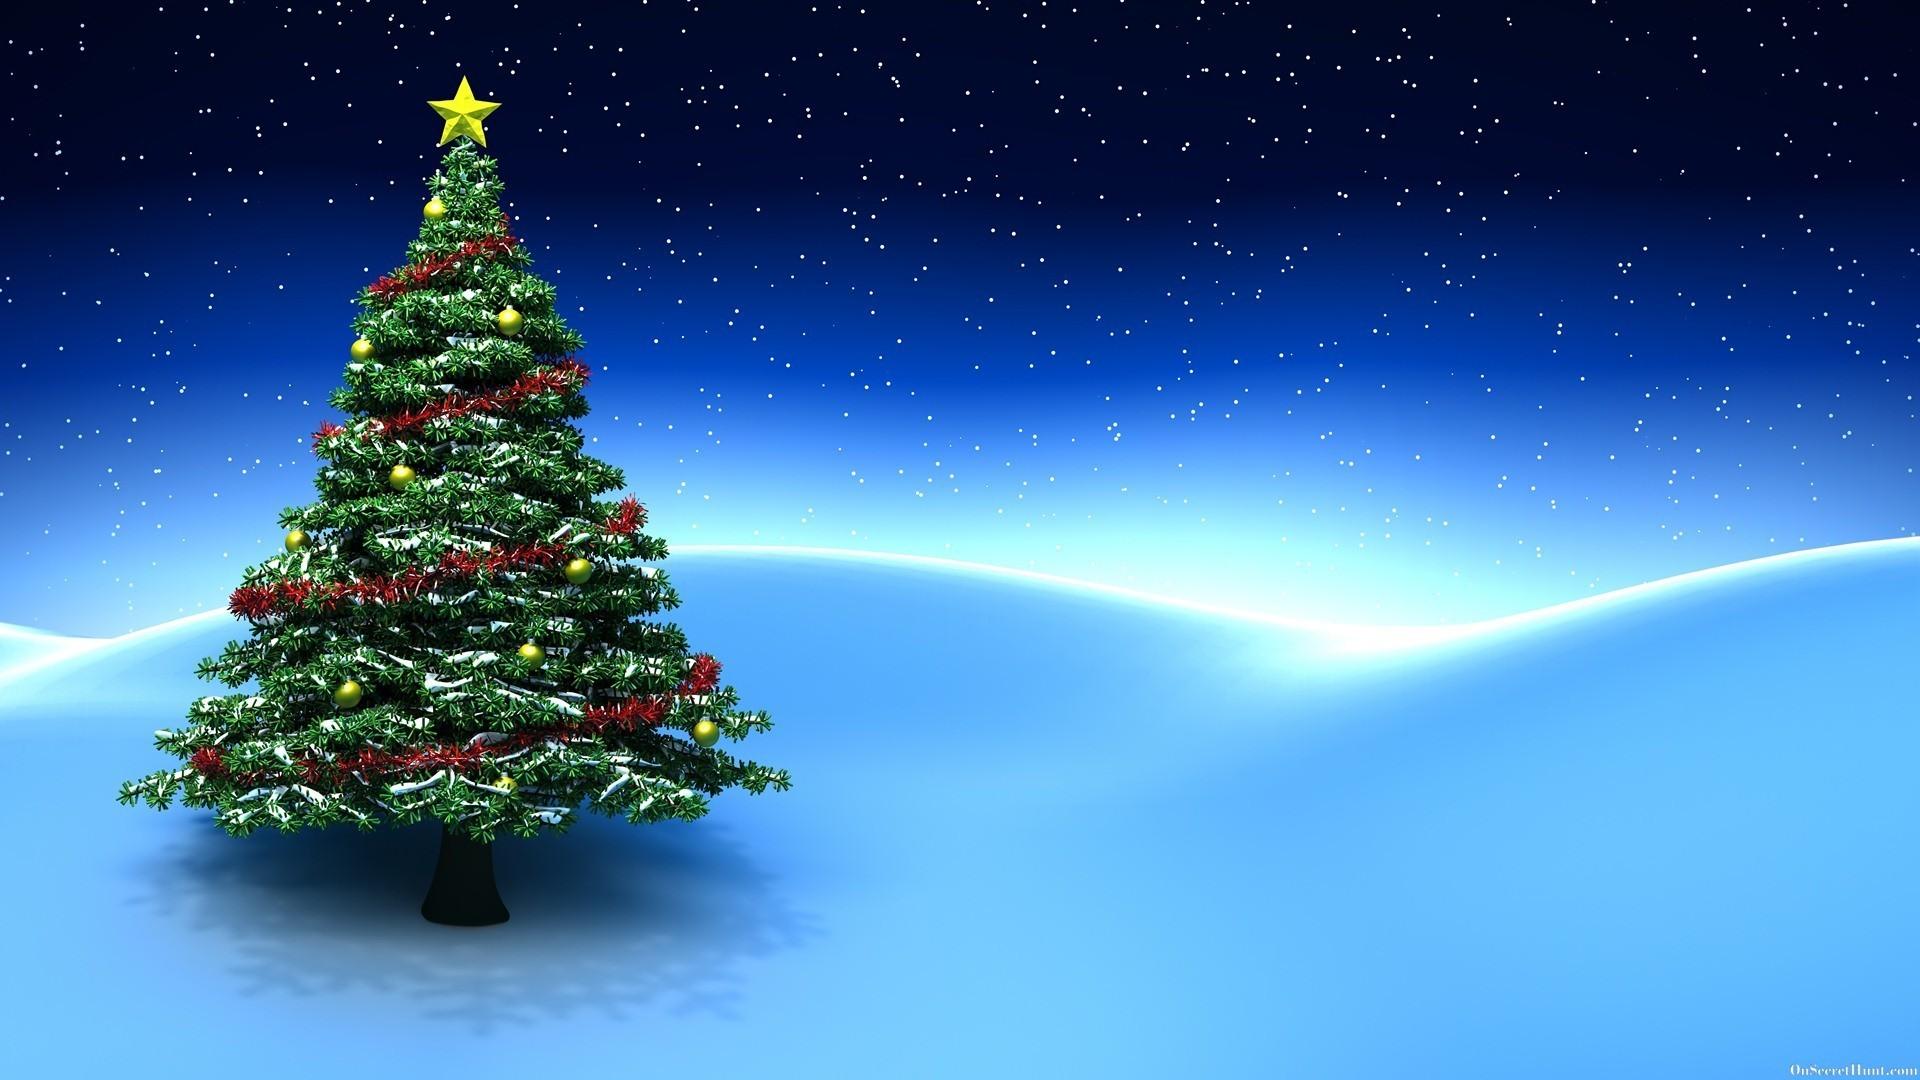 Res: 1920x1080,  Free Desktop Christmas Wallpaper Backgrounds - Wallpaper Cave ...  Download · Blue Christmas Wallpaper ...